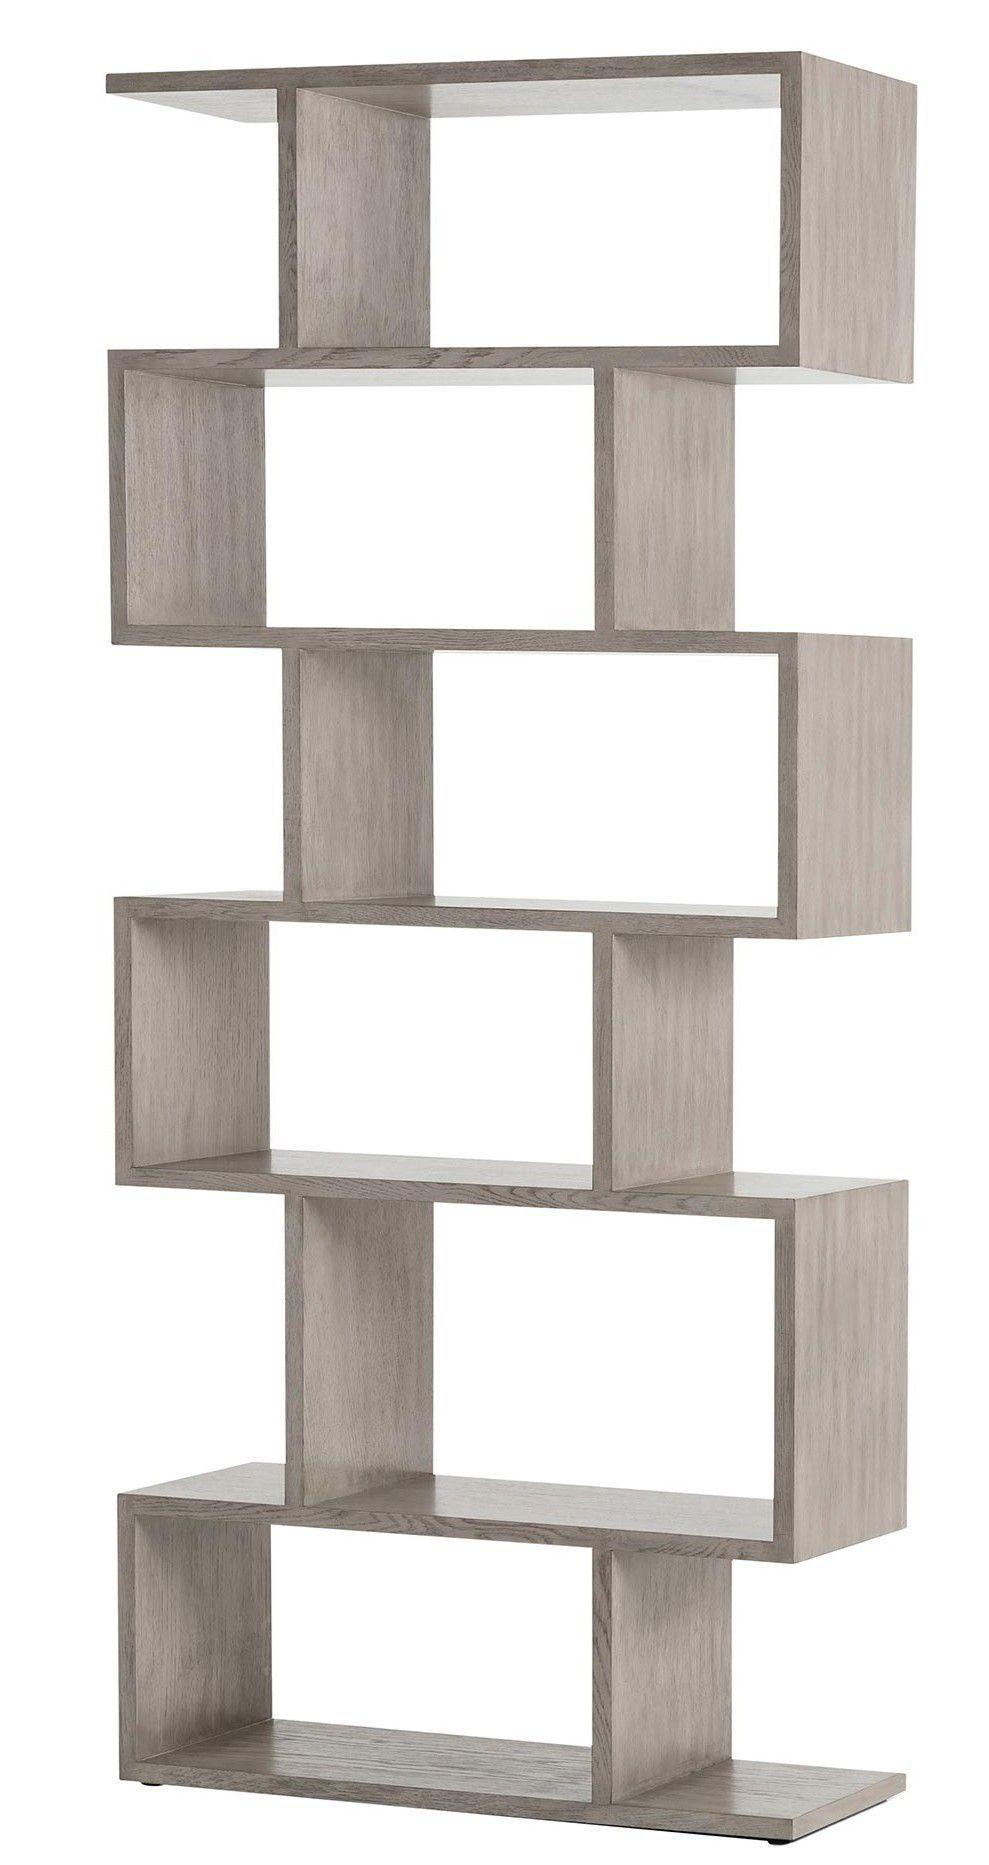 Alama Bookcase Open Shelving Bookcase Living Room Shop